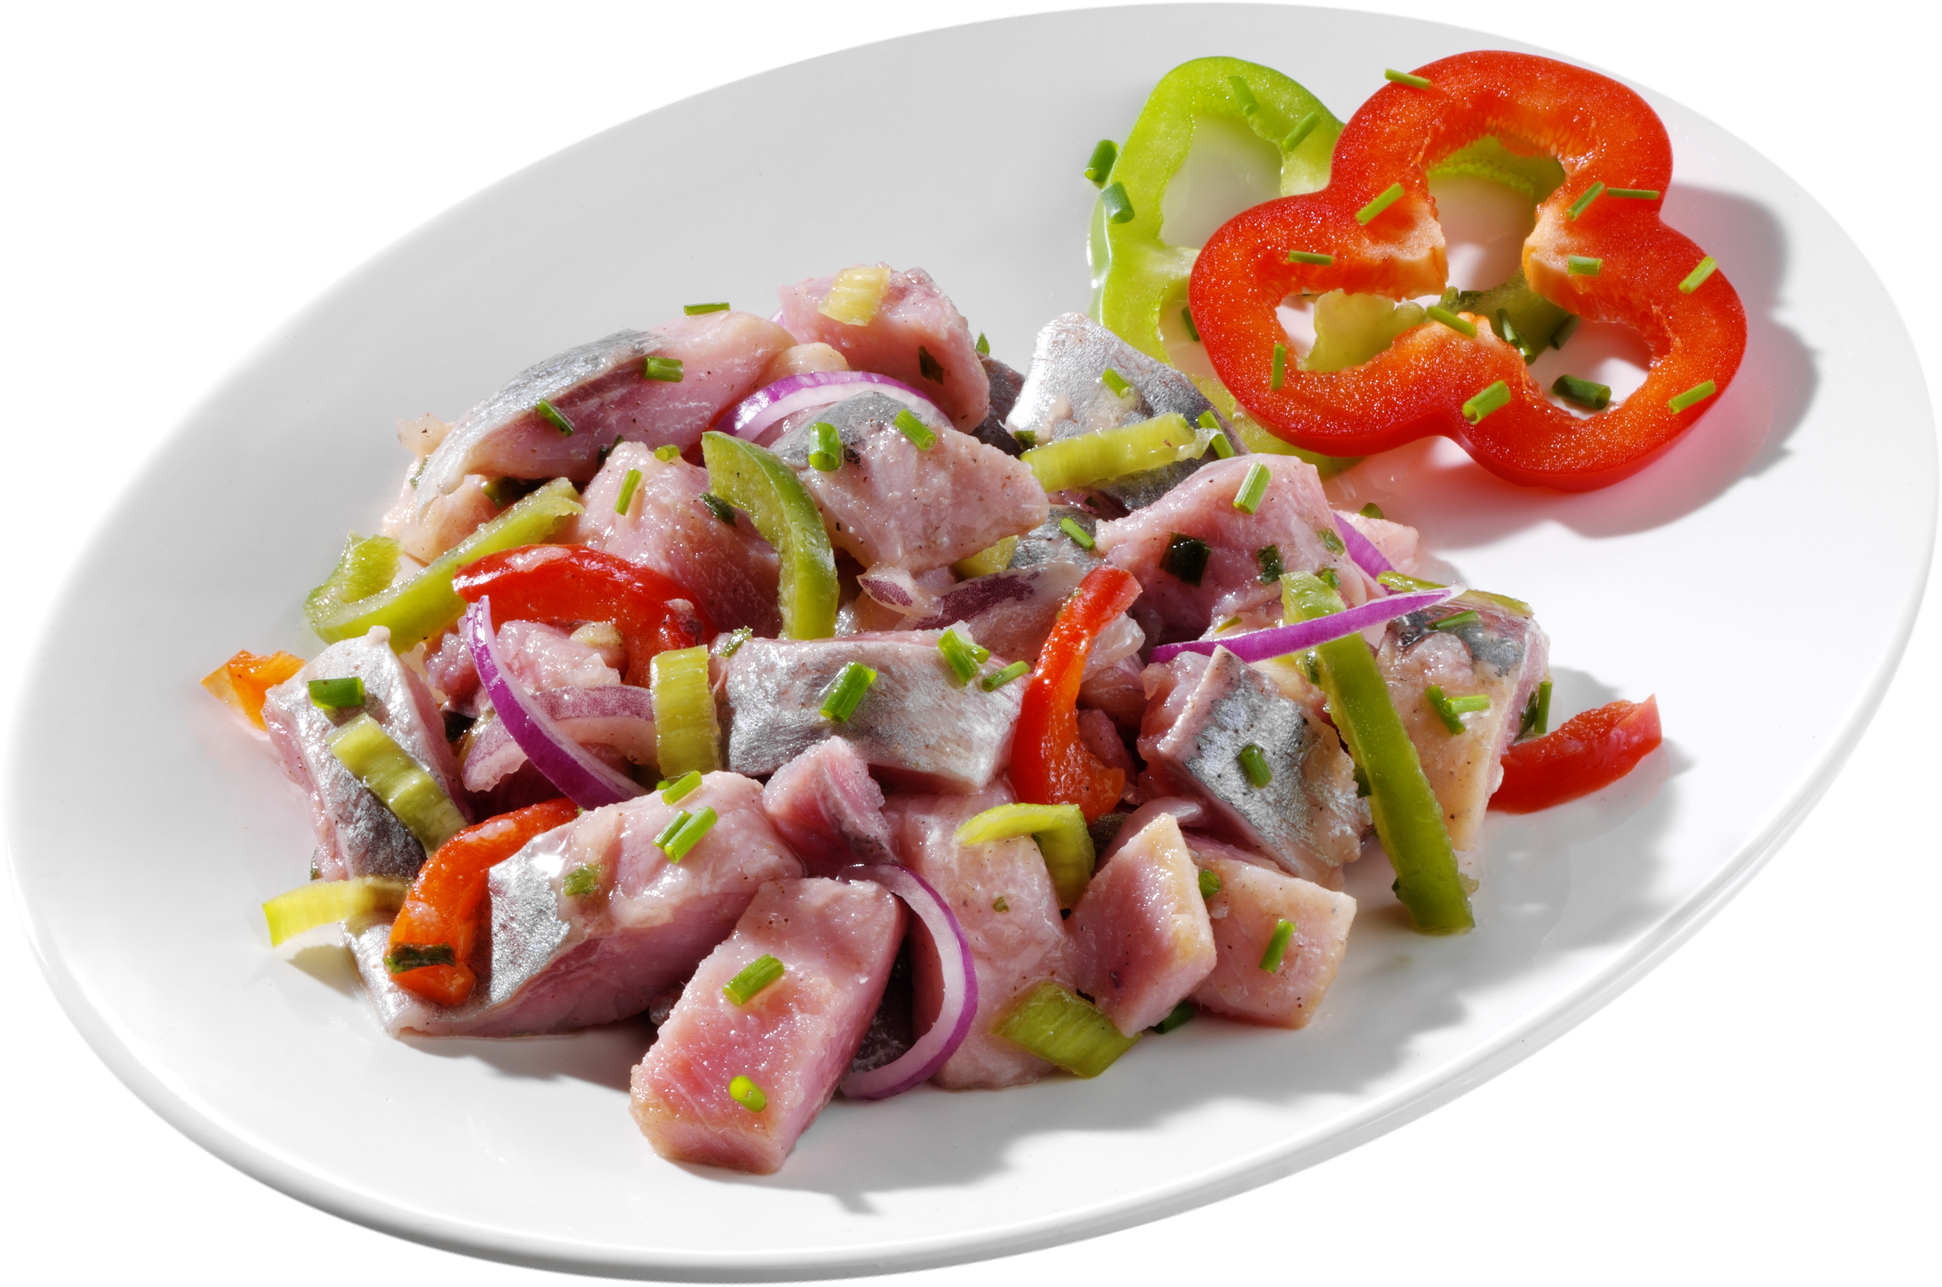 Bunter Matjes-Salat